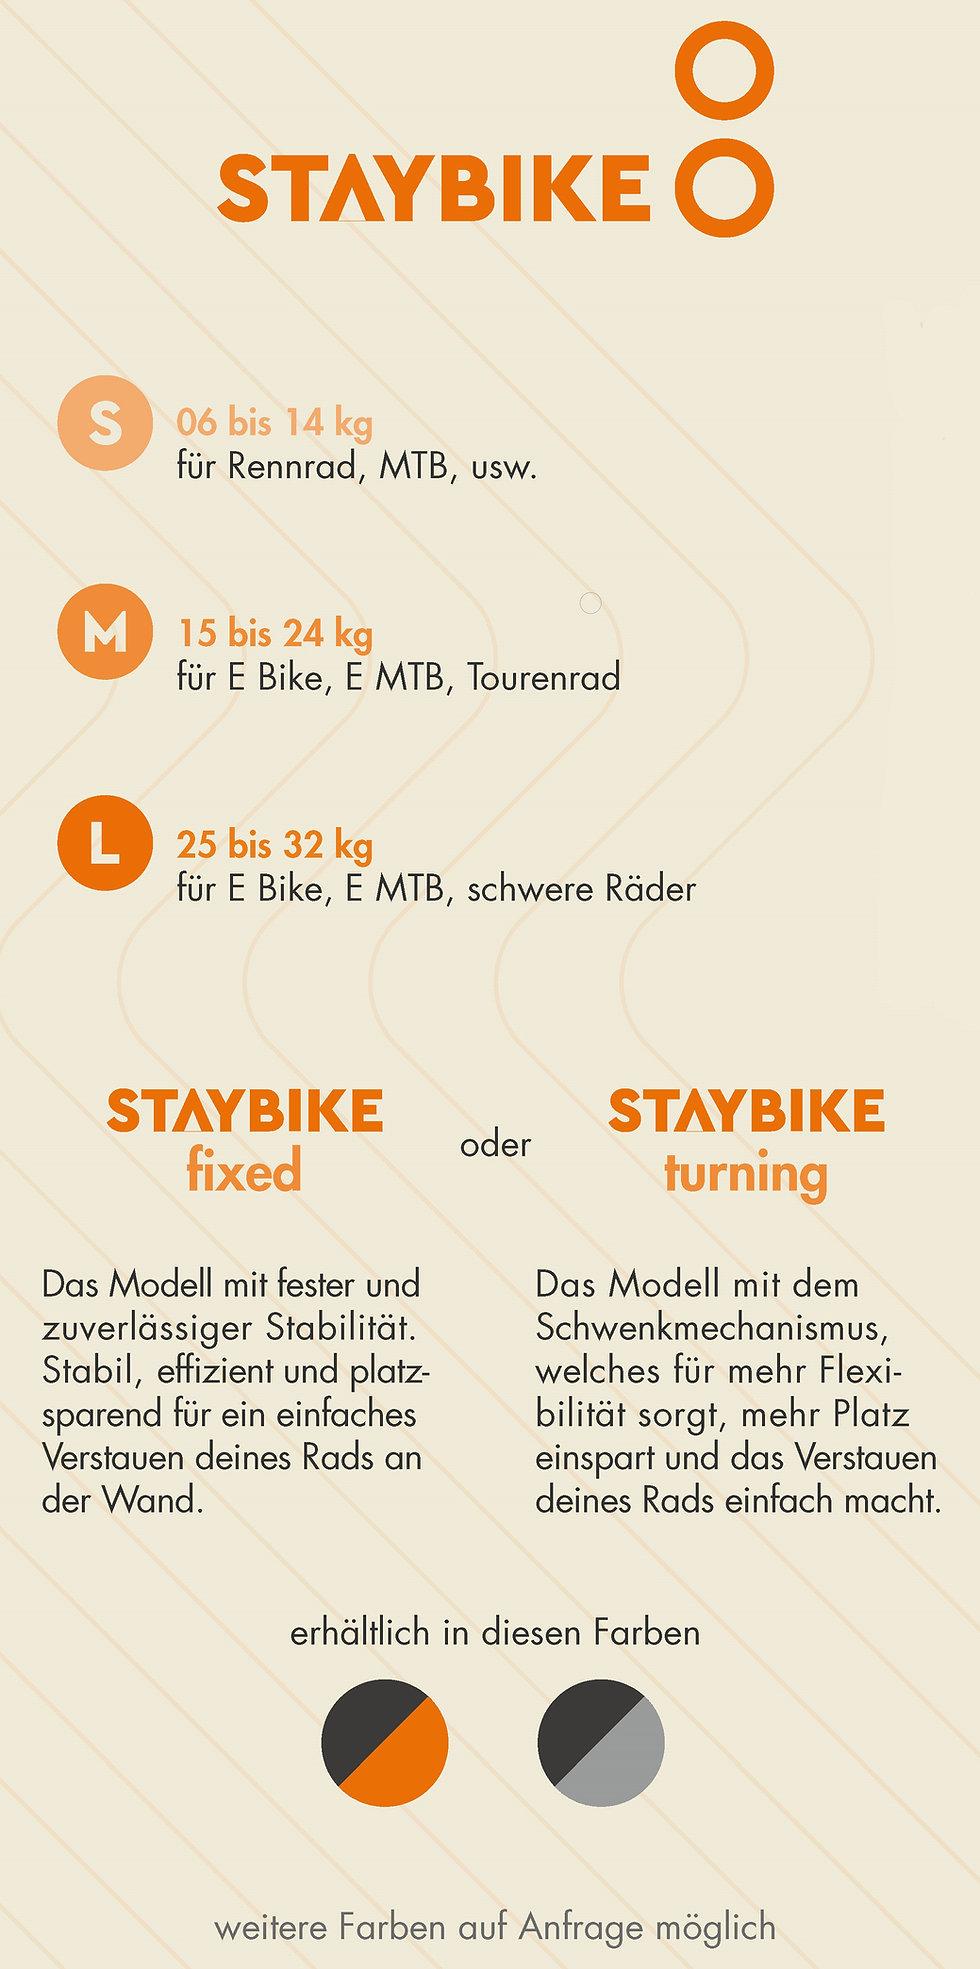 Staybike3.jpg